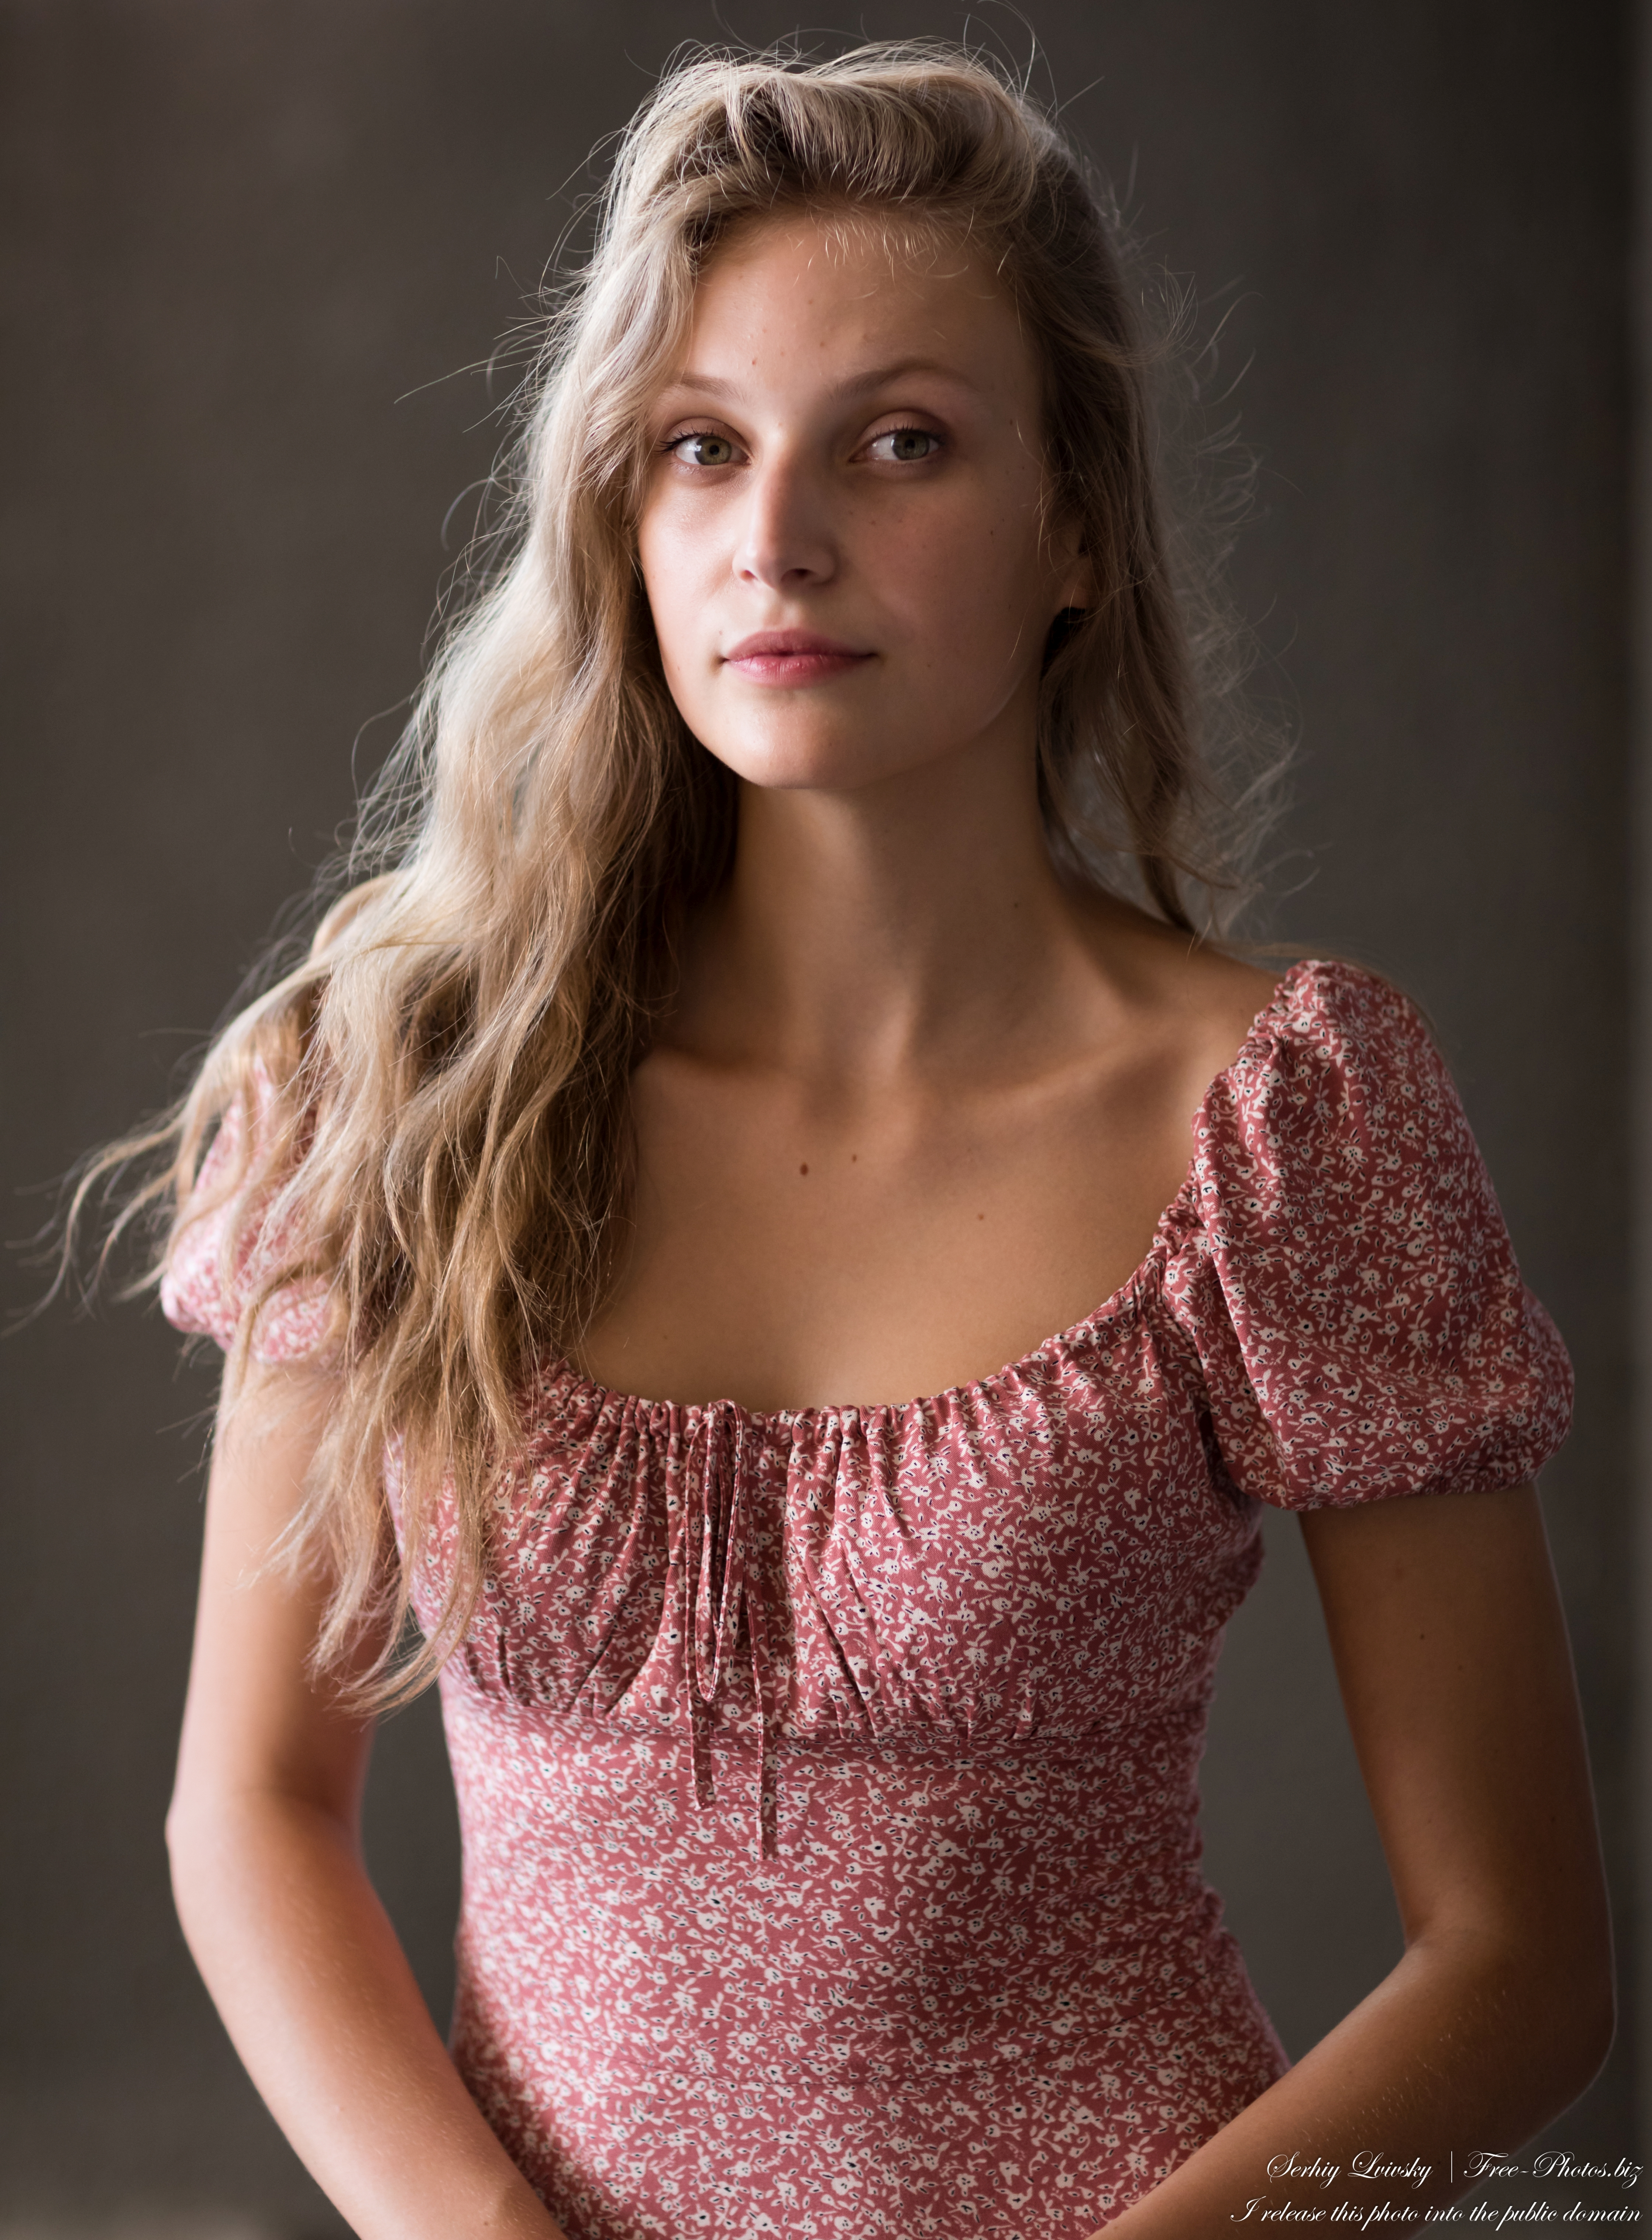 renata_a_22-year-old_natural_blonde_woman_july_2021_by_serhiy_lvivsky_08